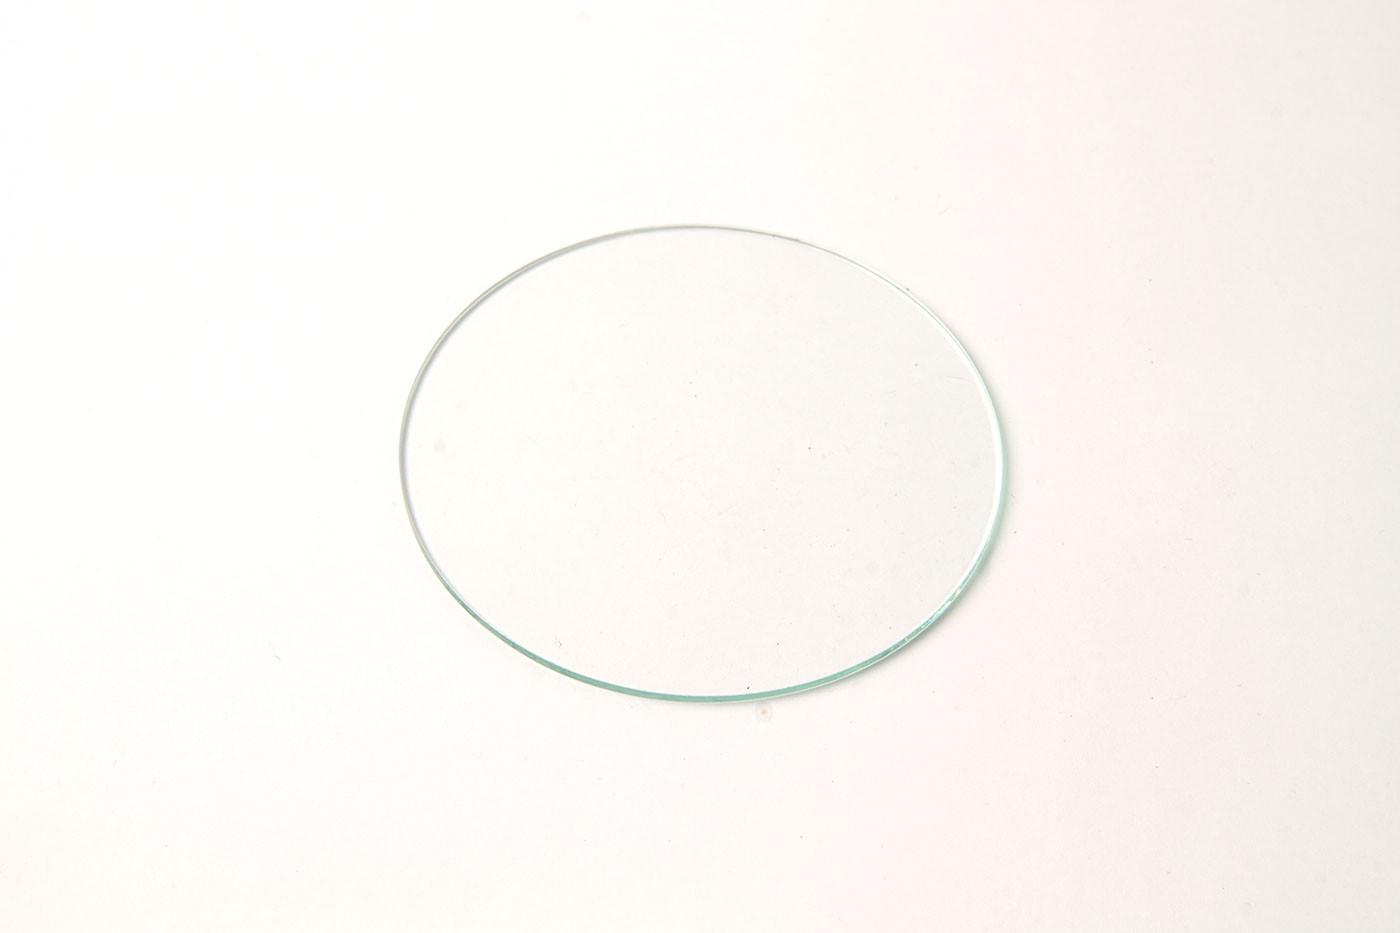 Instrument glass